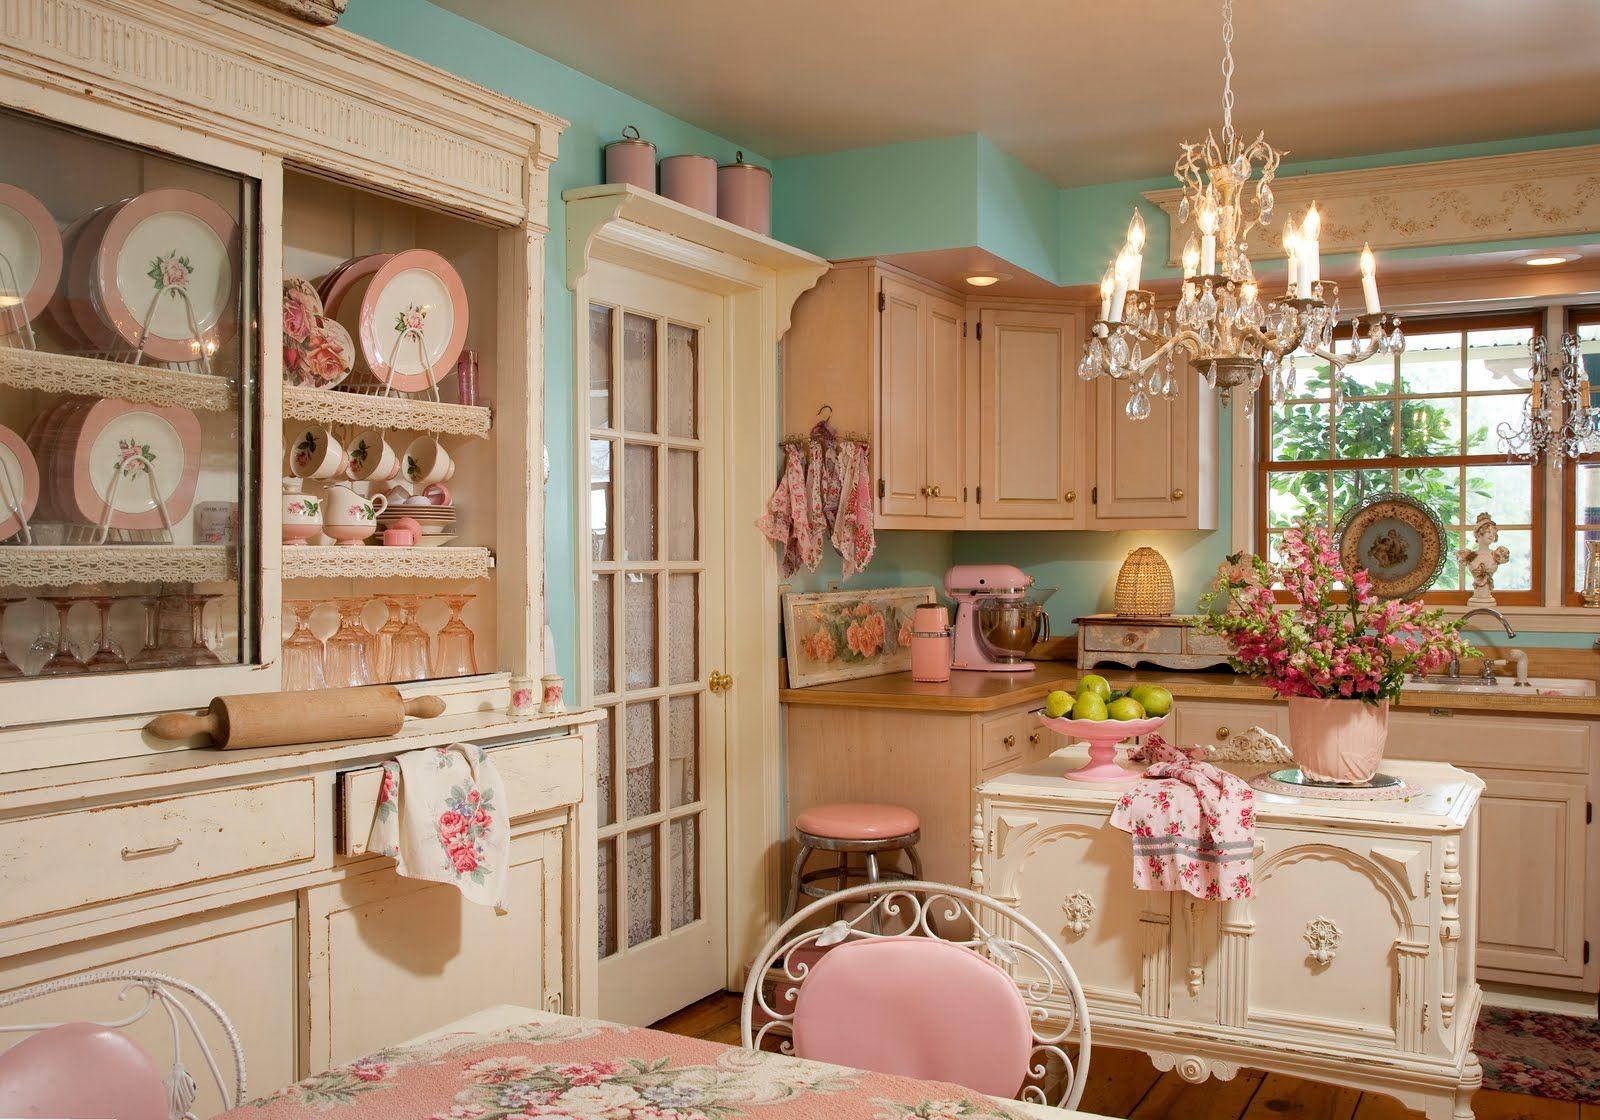 Shabby Chic Kitchen Colors | Southern Style Kitchen | Pinterest ...